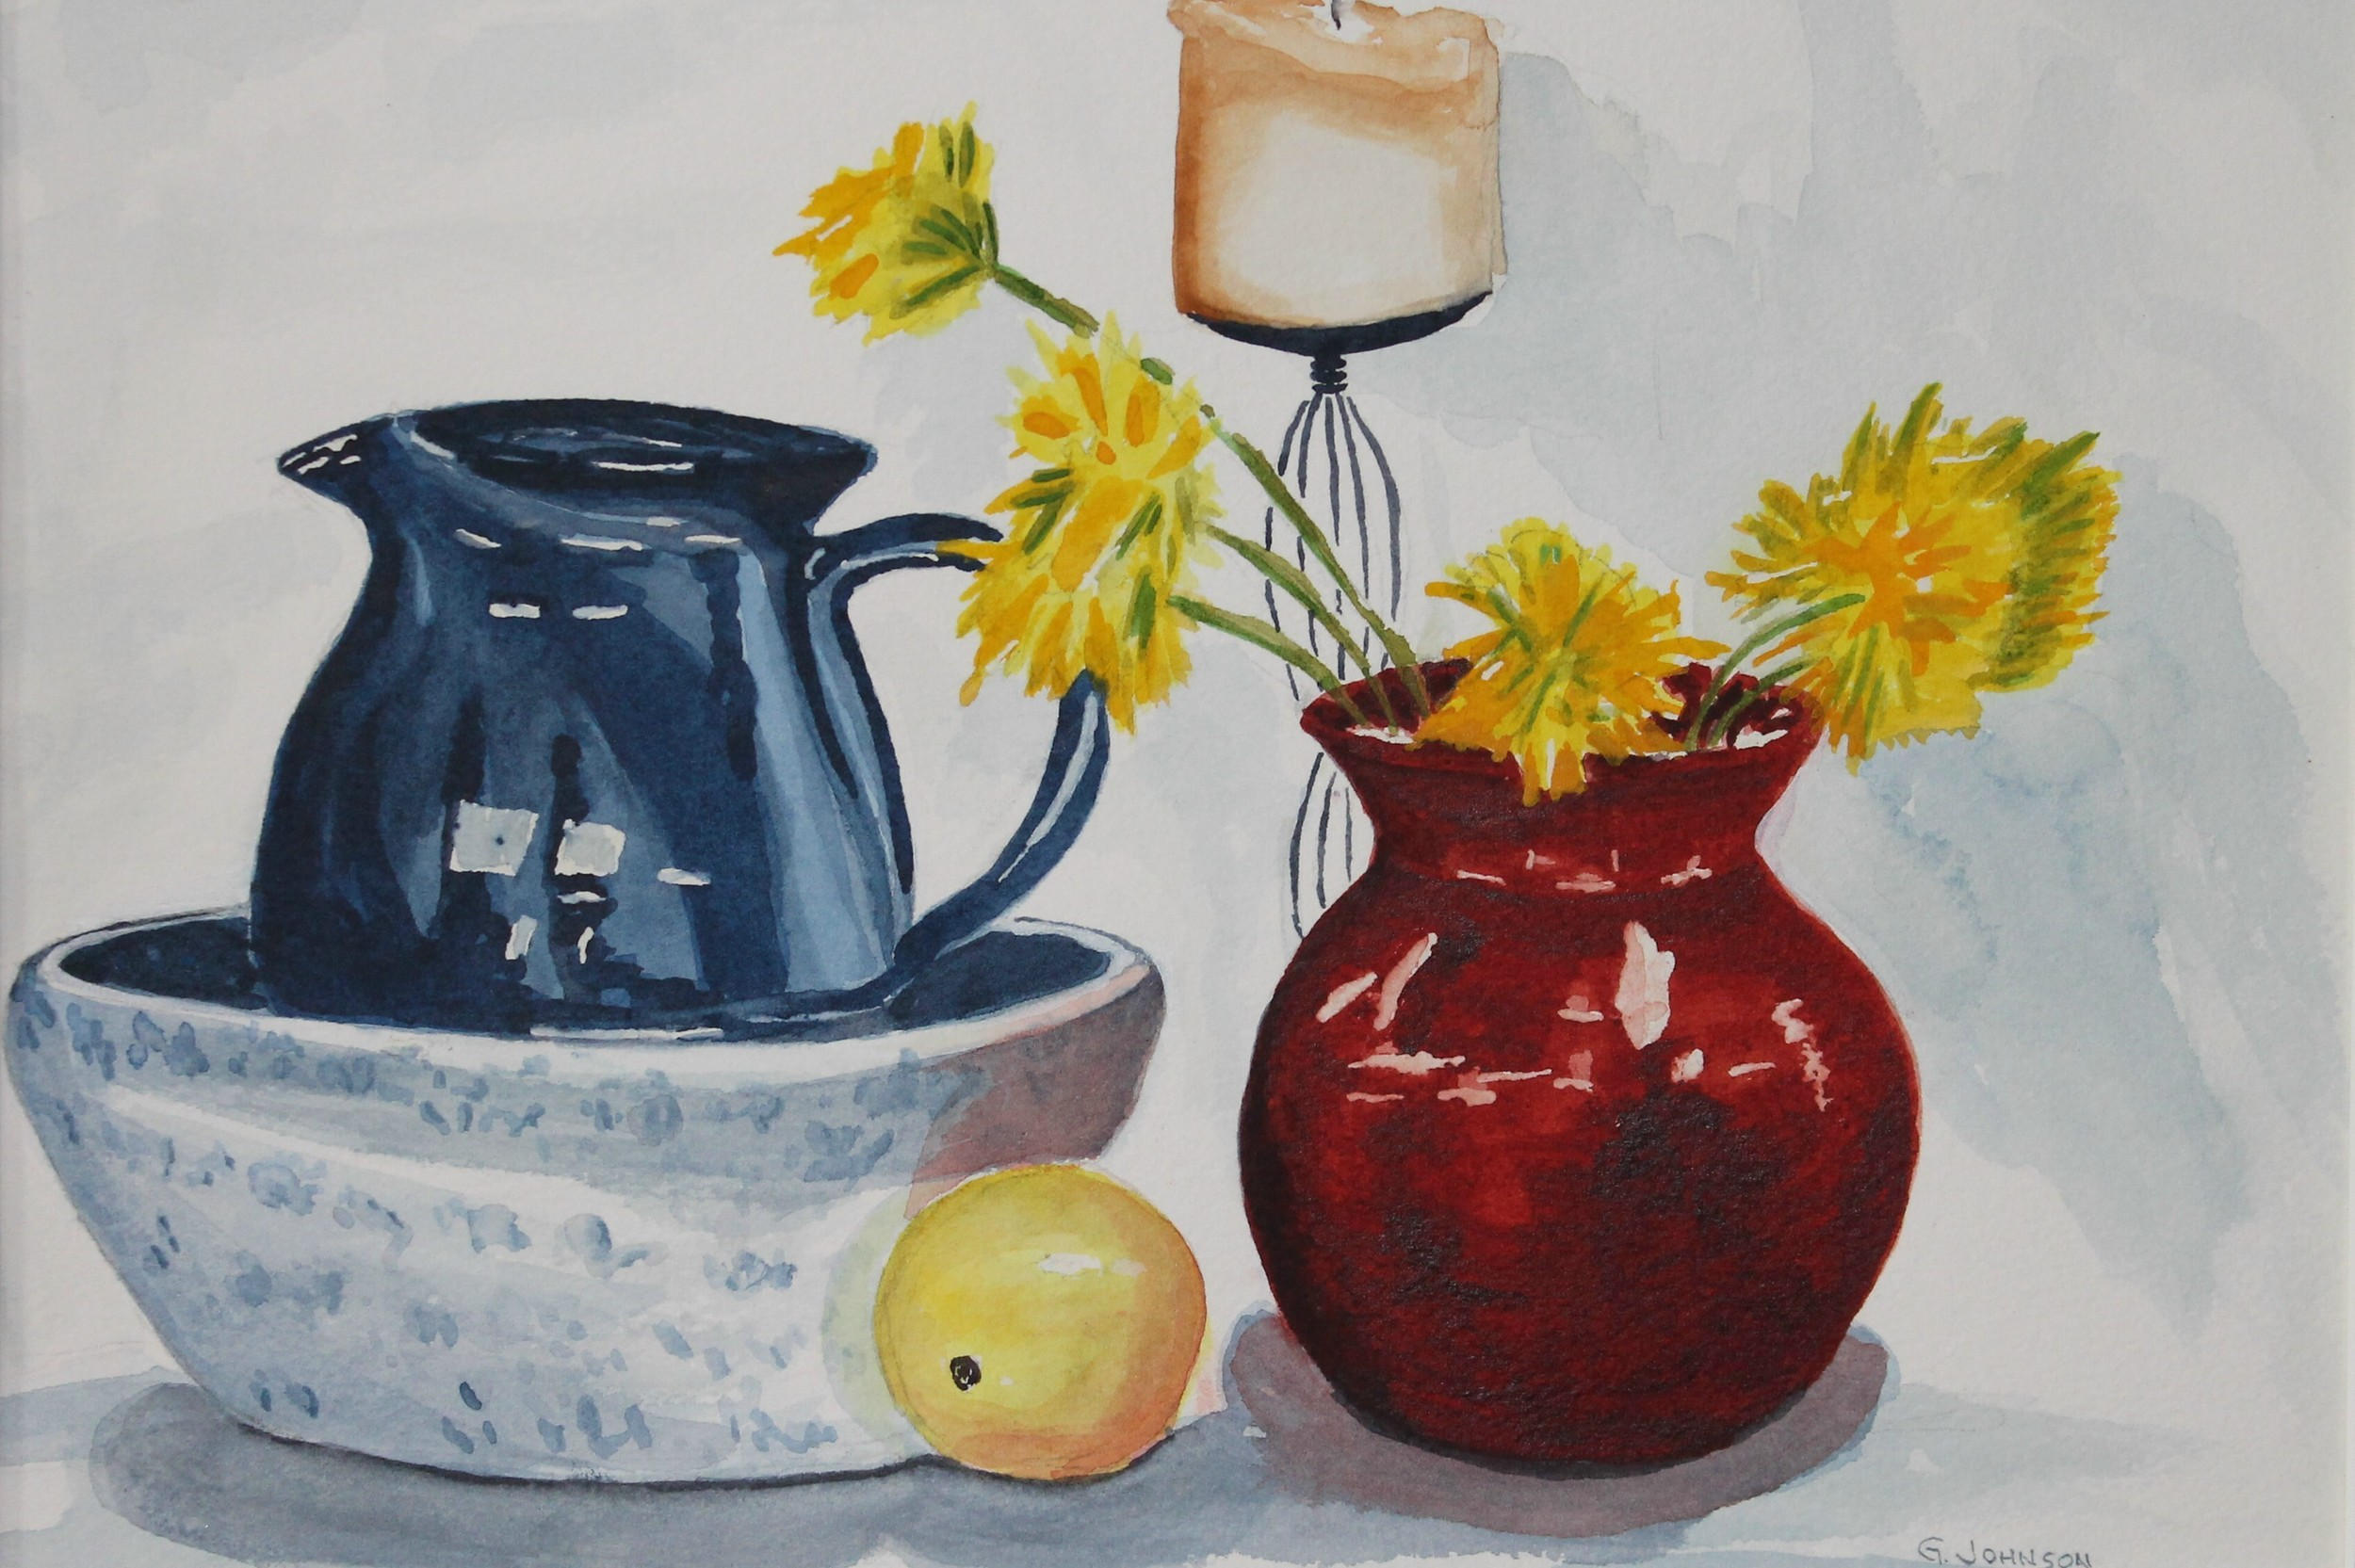 Lemon, Red Vase, Blue Pitcher. Still Life. Not For Sale. Artists collection.